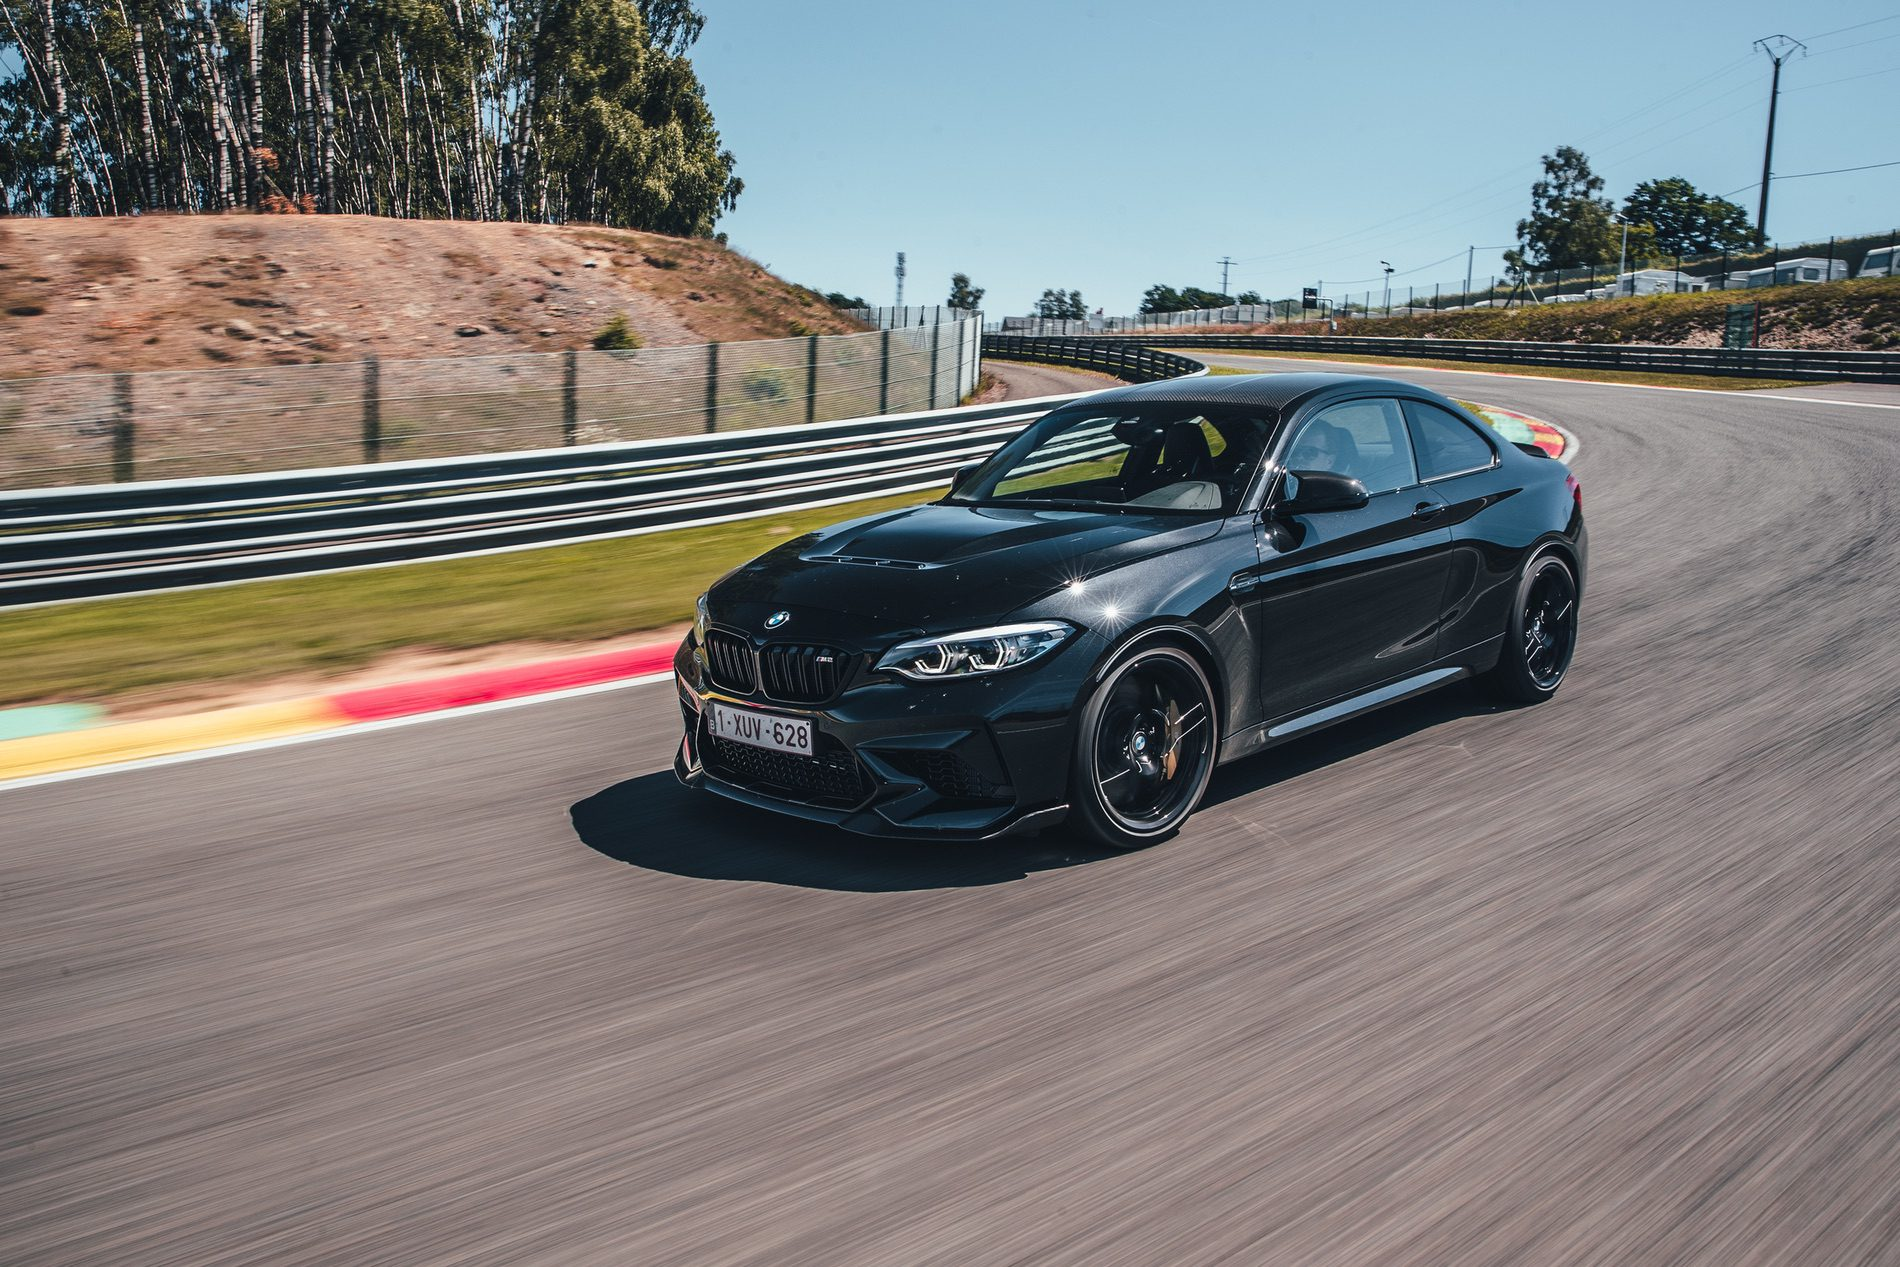 2021 BMW M2 CS Black Sapphire 07